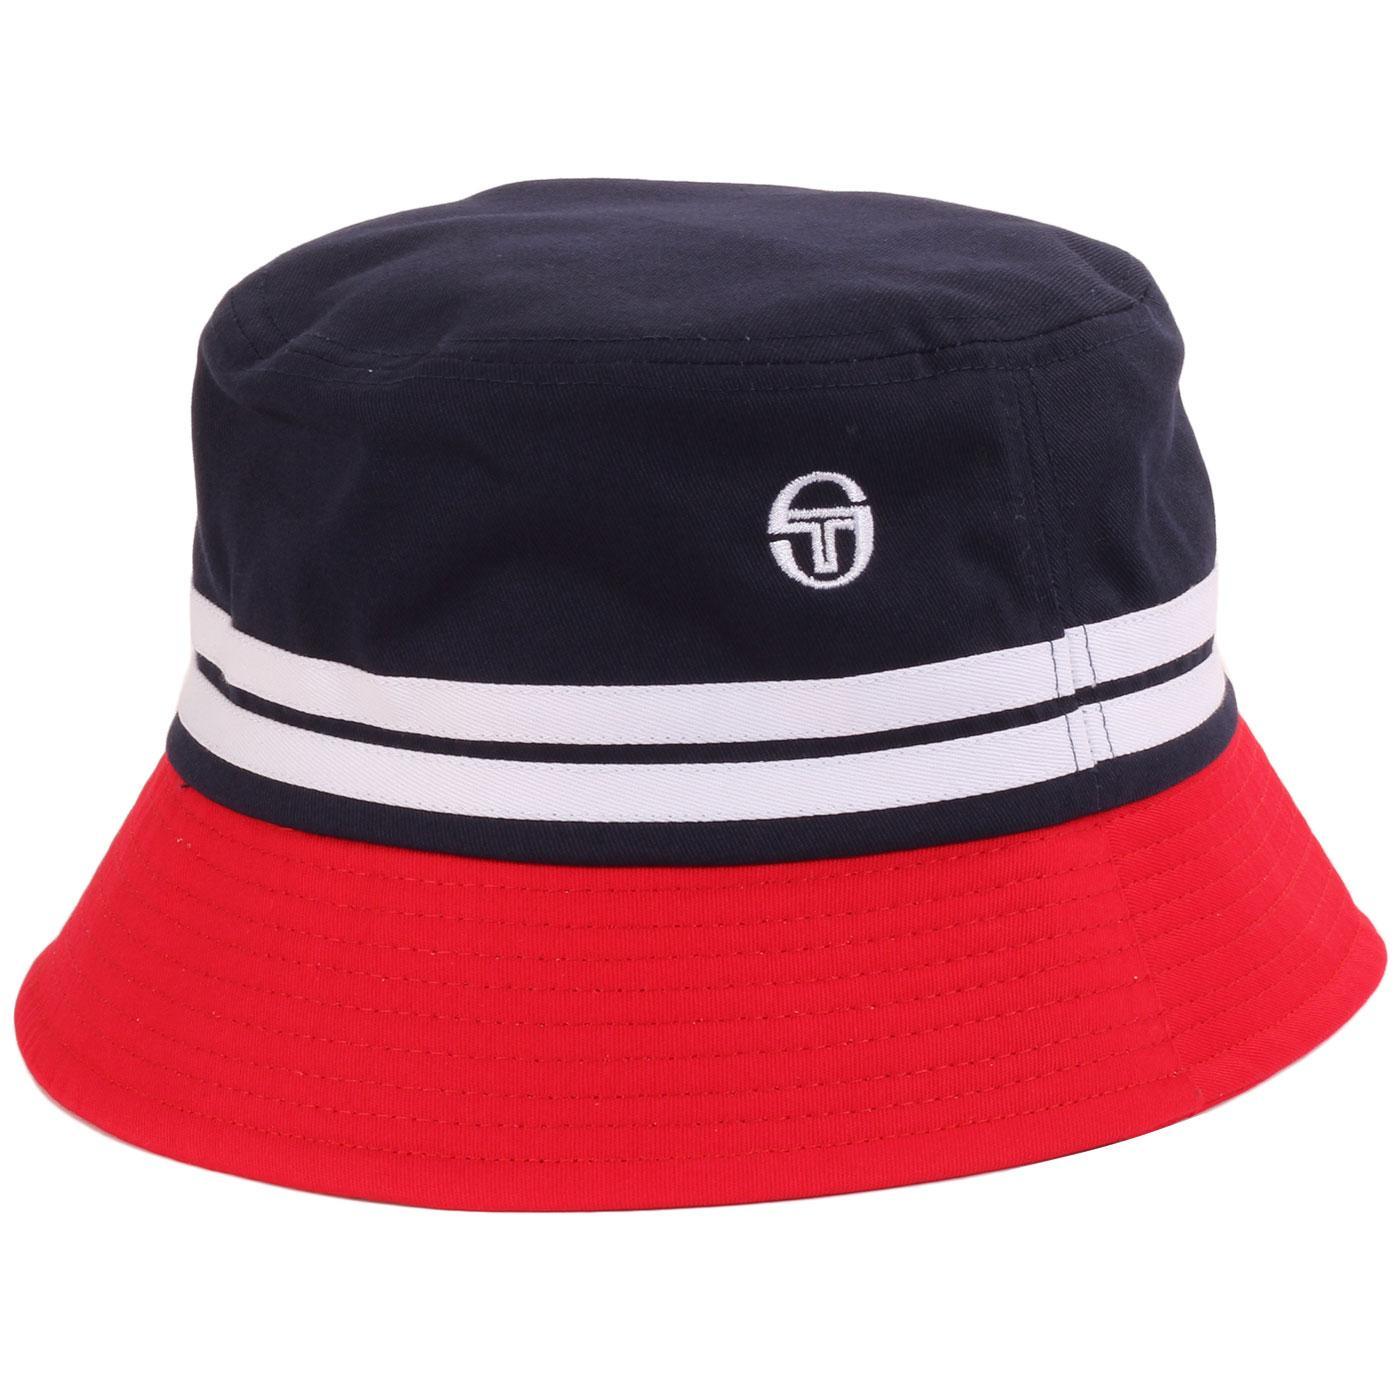 Stonewoods SERGIO TACCHINI Retro Bucket Hat (N/R)